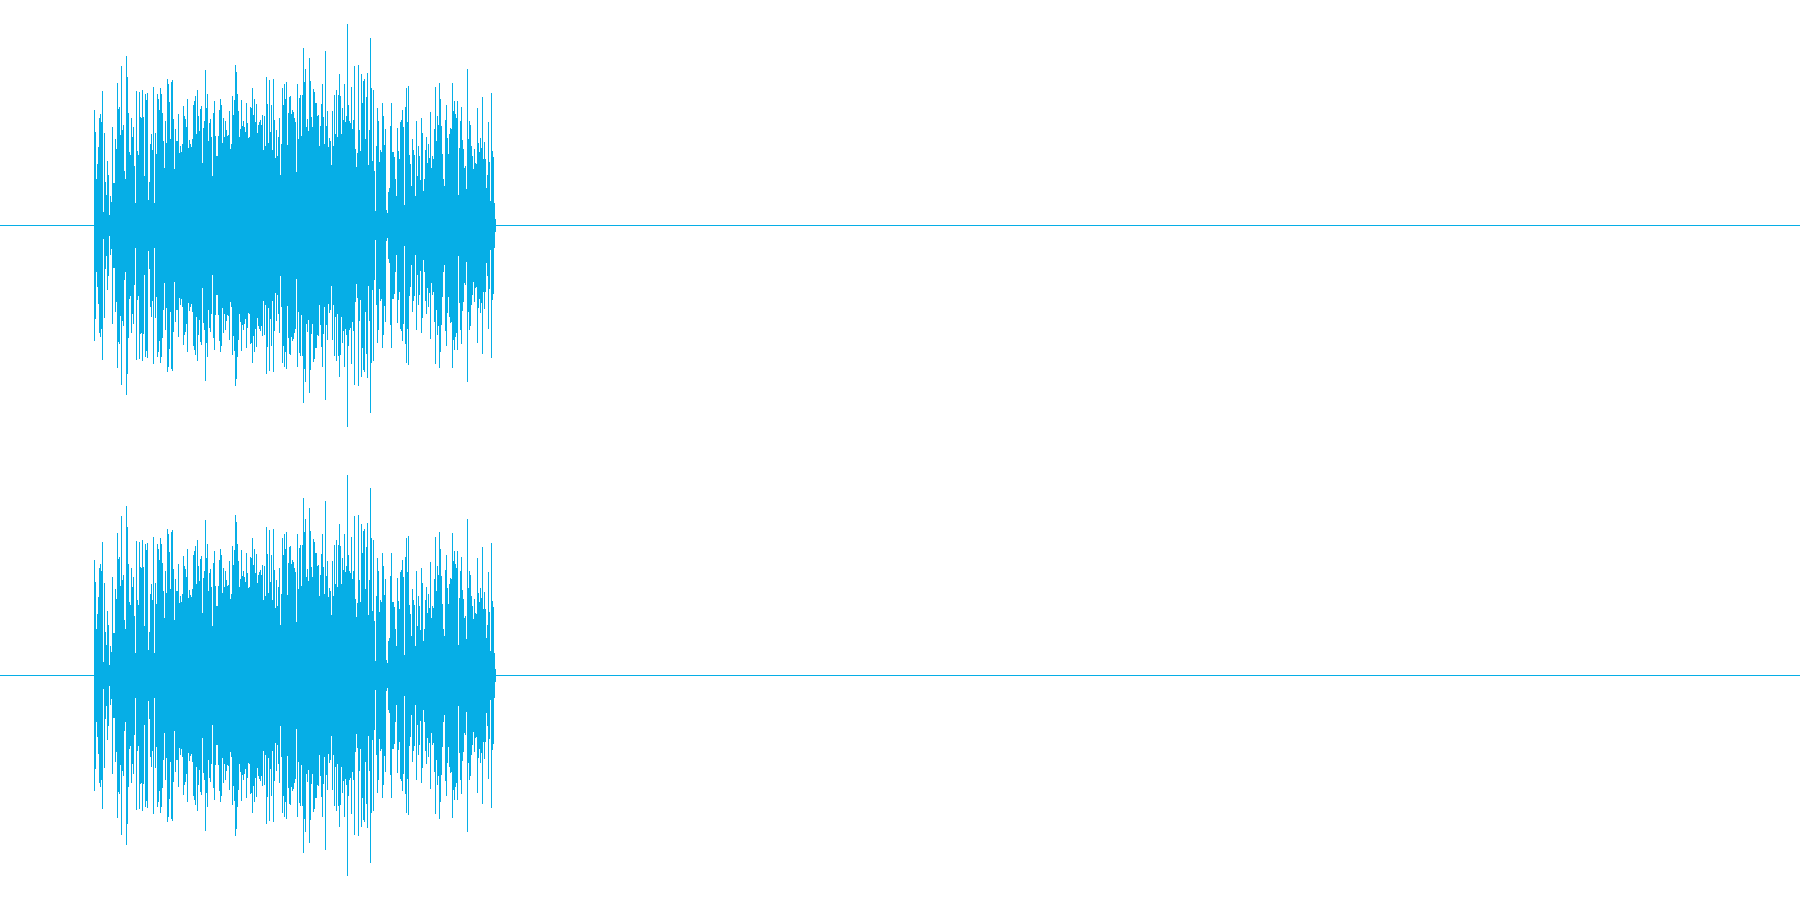 【NES RPG03-06(魔法 雷)】の再生済みの波形